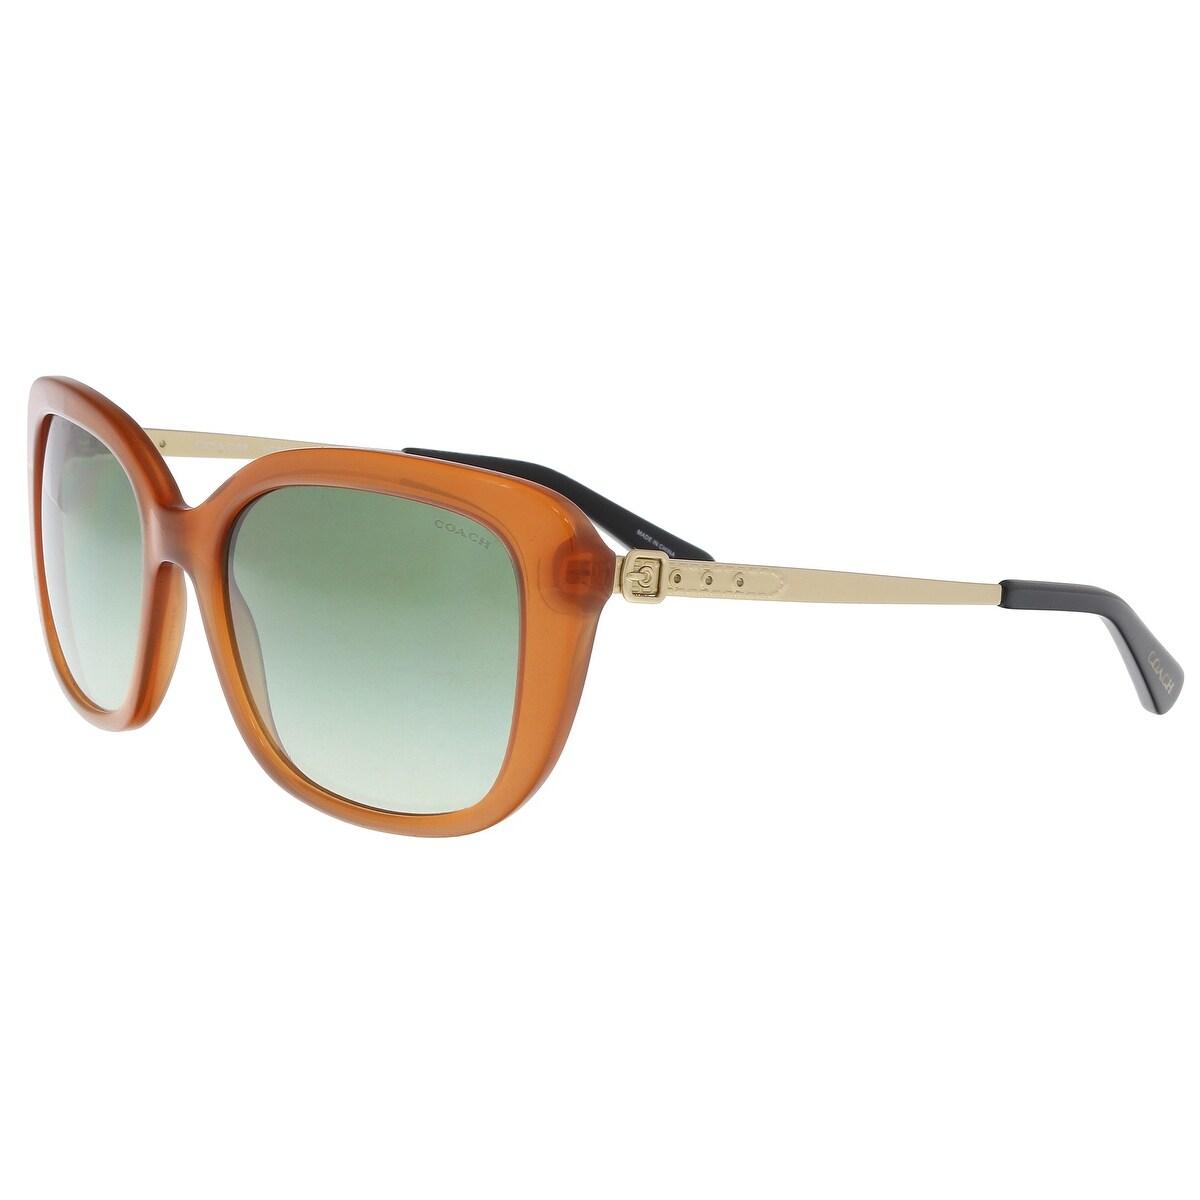 fcf7227b8bab ... greece shop coach hc8229 55028e amber rectangle sunglasses 55 18 140 on  sale free shipping today